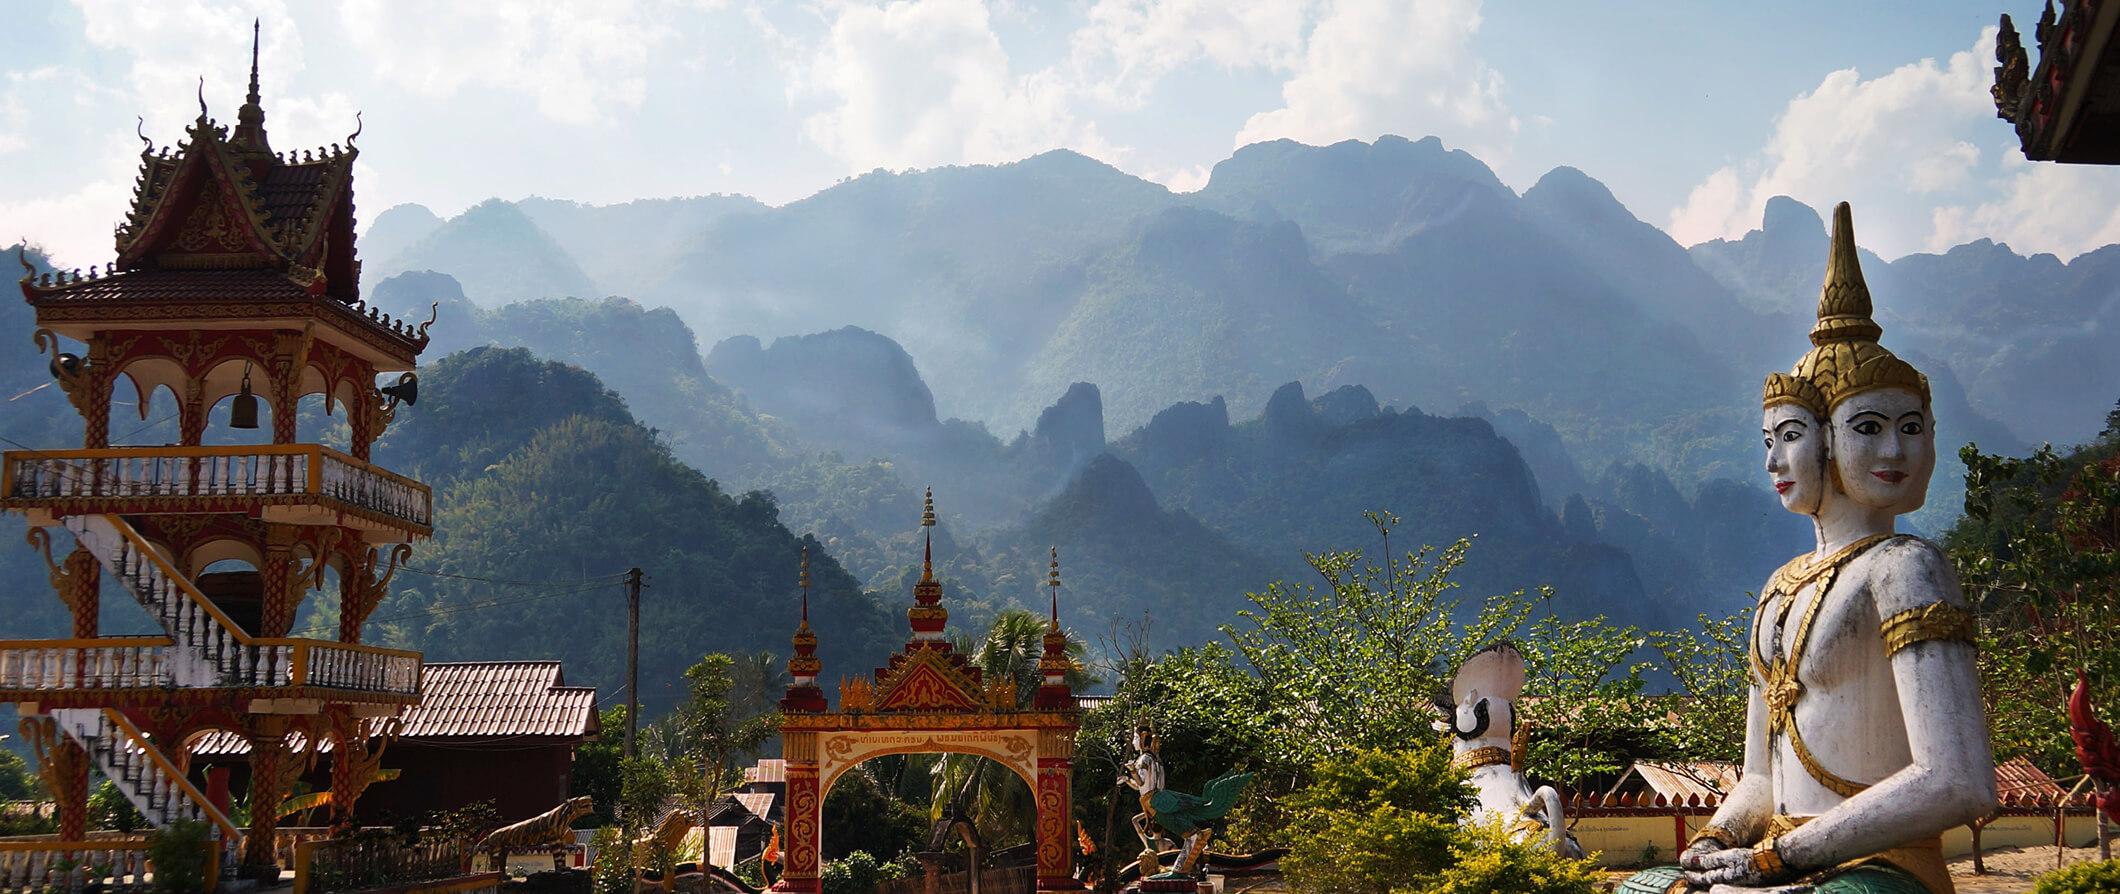 Vang Vieng in Laos Trip Feb-Mar 2015 (Blue Lagoon) - YouTube   Vang Vieng Trip